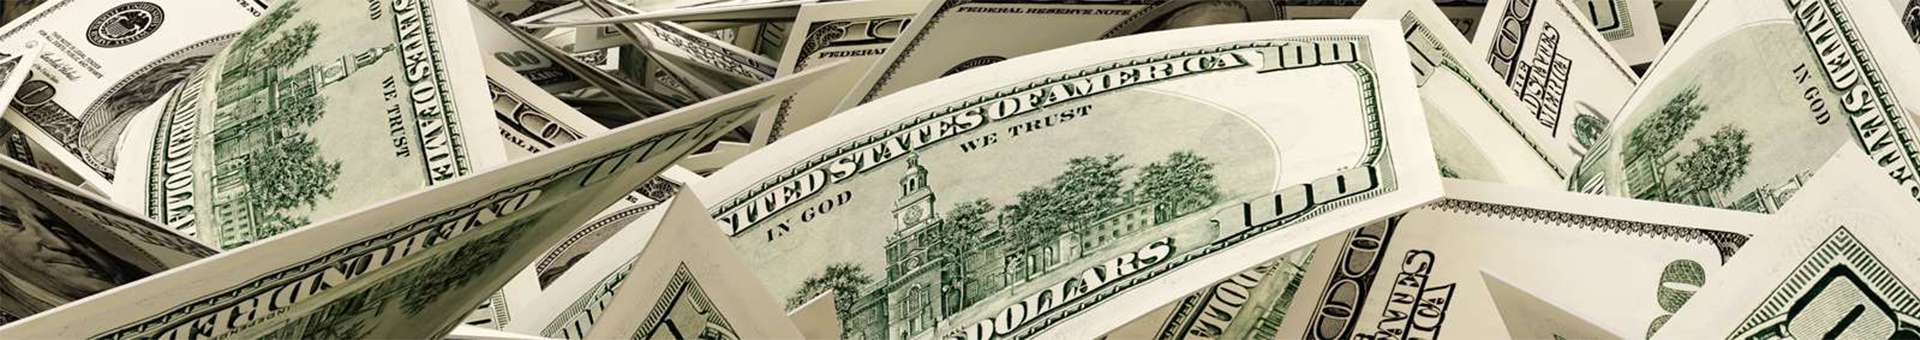 Búsqueda de información Whois de nombres de dominios  .money